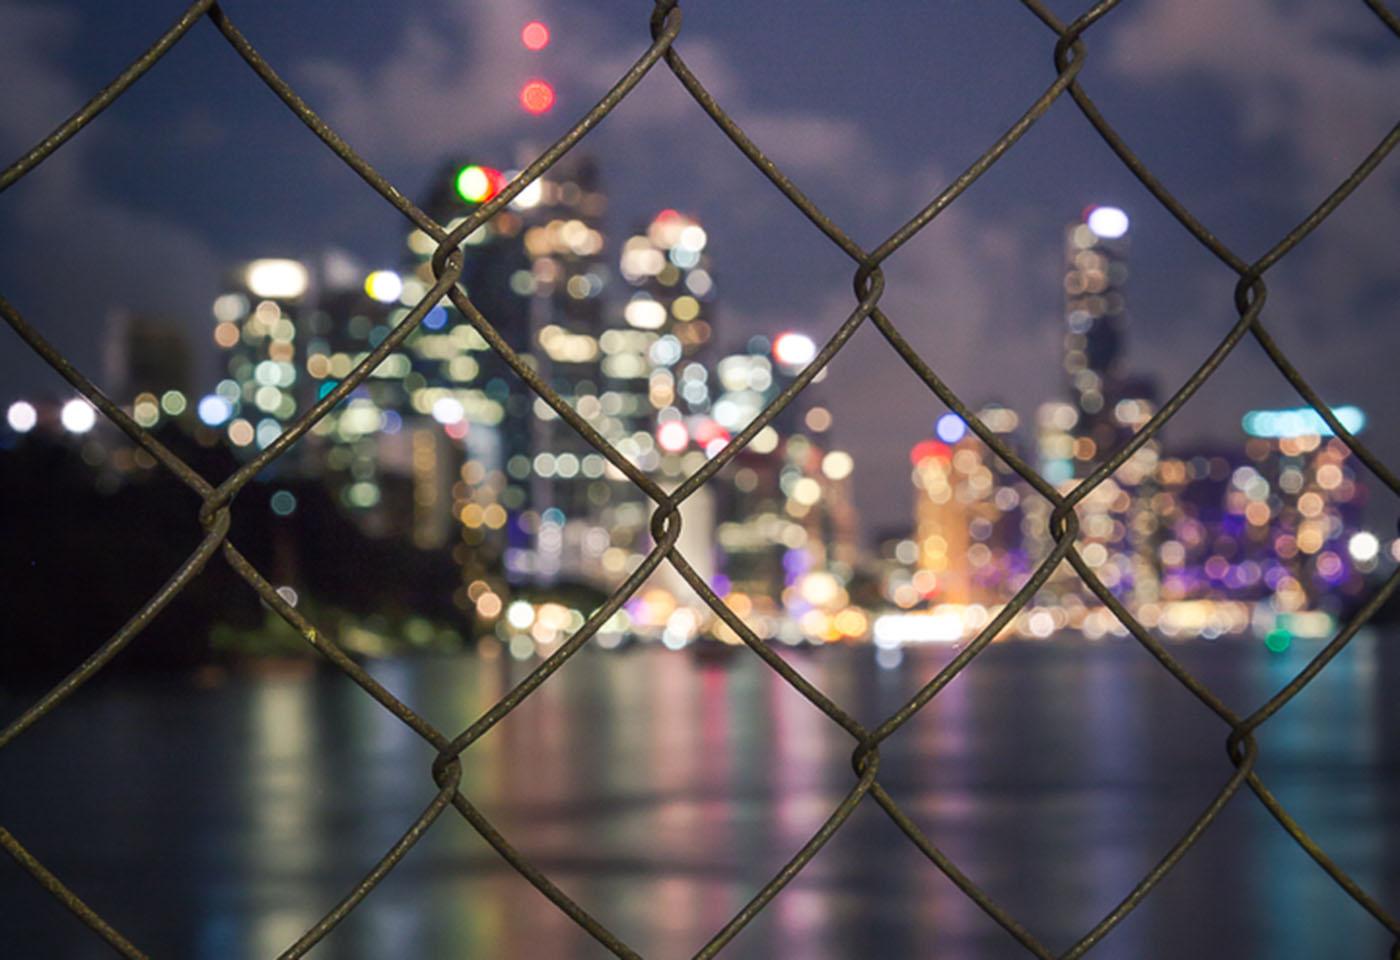 Landscape image of Kangaroo Point through a gate